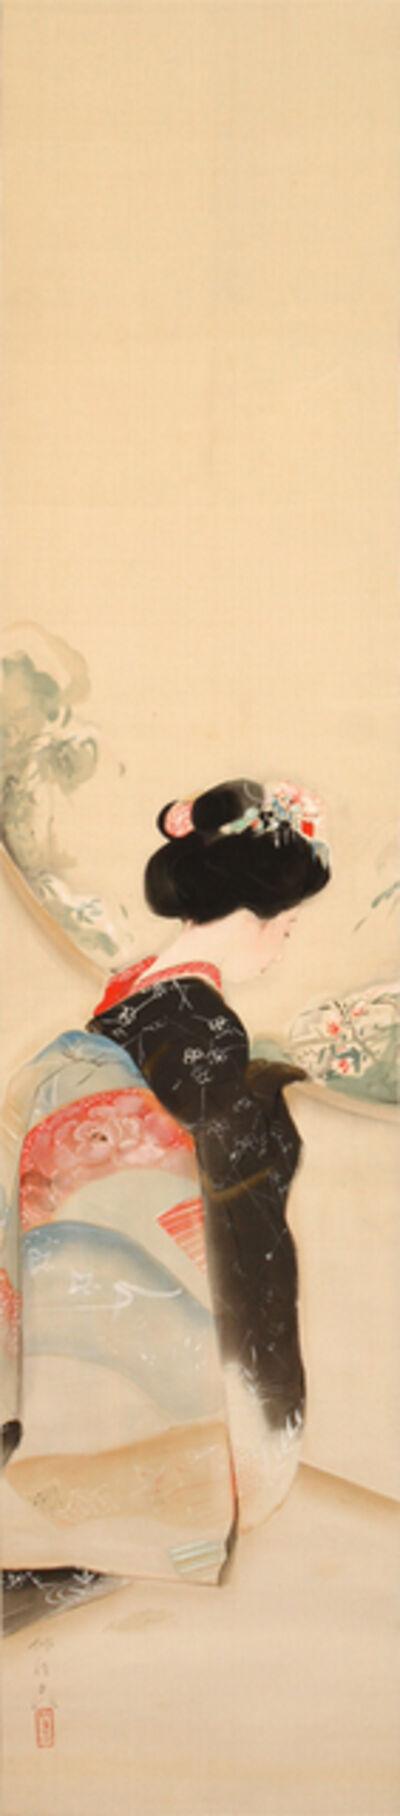 Hisako Kajiwara, 'Snow View from the Window', 1930